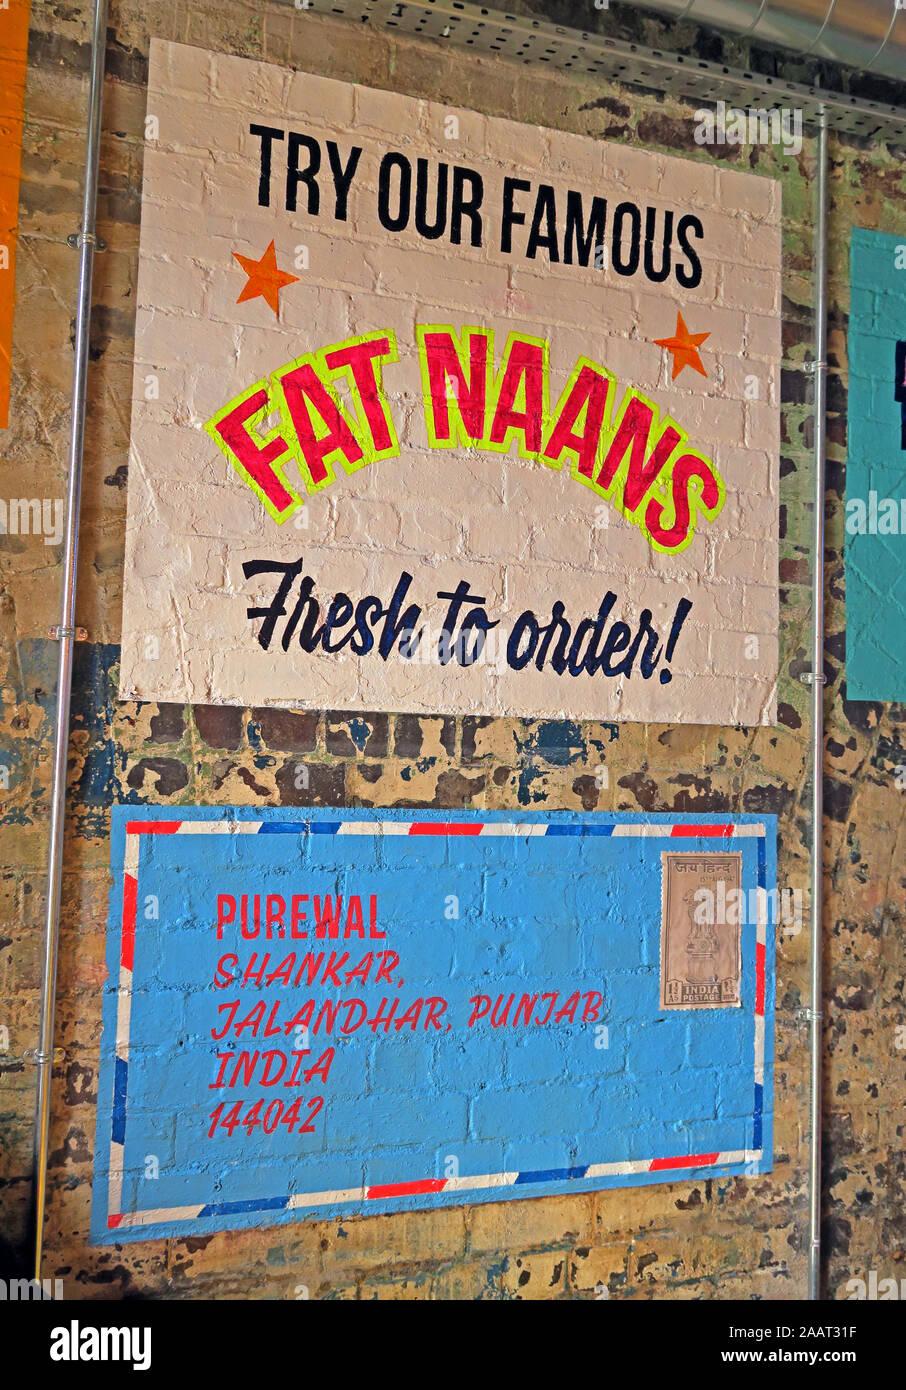 HotpixUk,@HotpixUK,GoTonySmith,UK,England,English,Birmingham,West Midlands,city Centre,Snowhill,B3 1EU,sign,poster,food,craft beer,ales